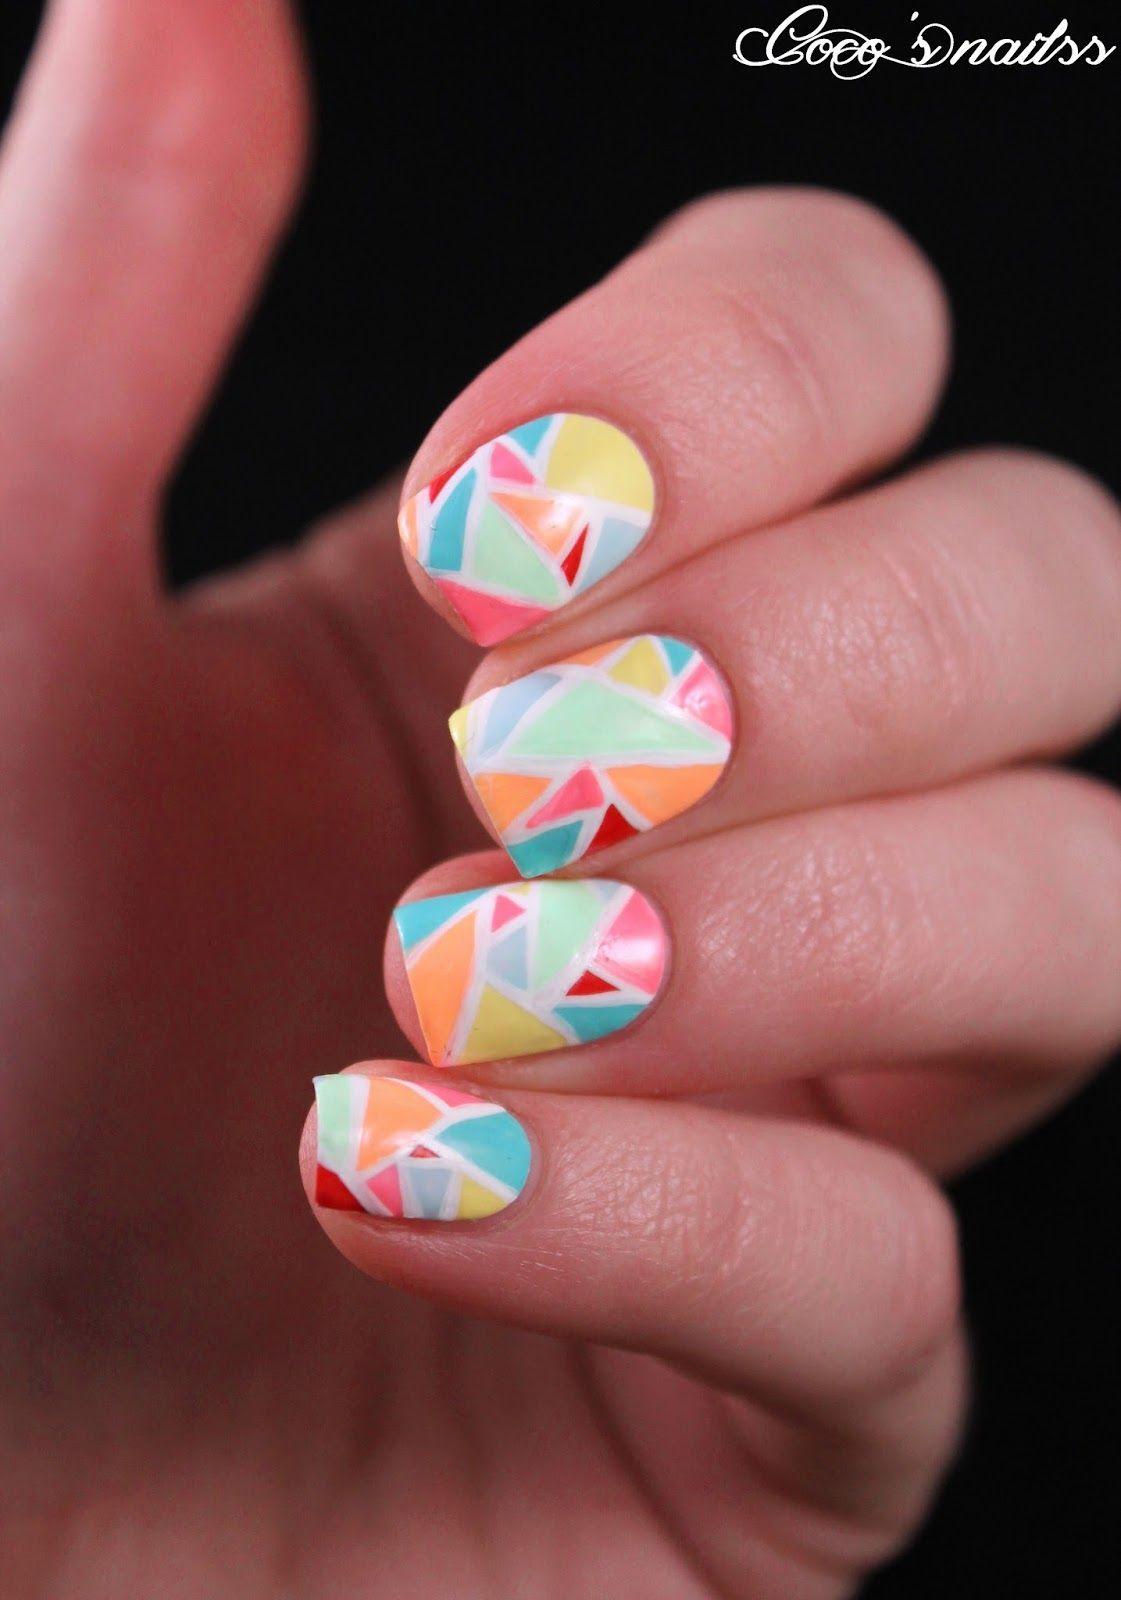 Coco ▲ ▼ ▲ ▲ ▼ ▲'s nails: Carnival